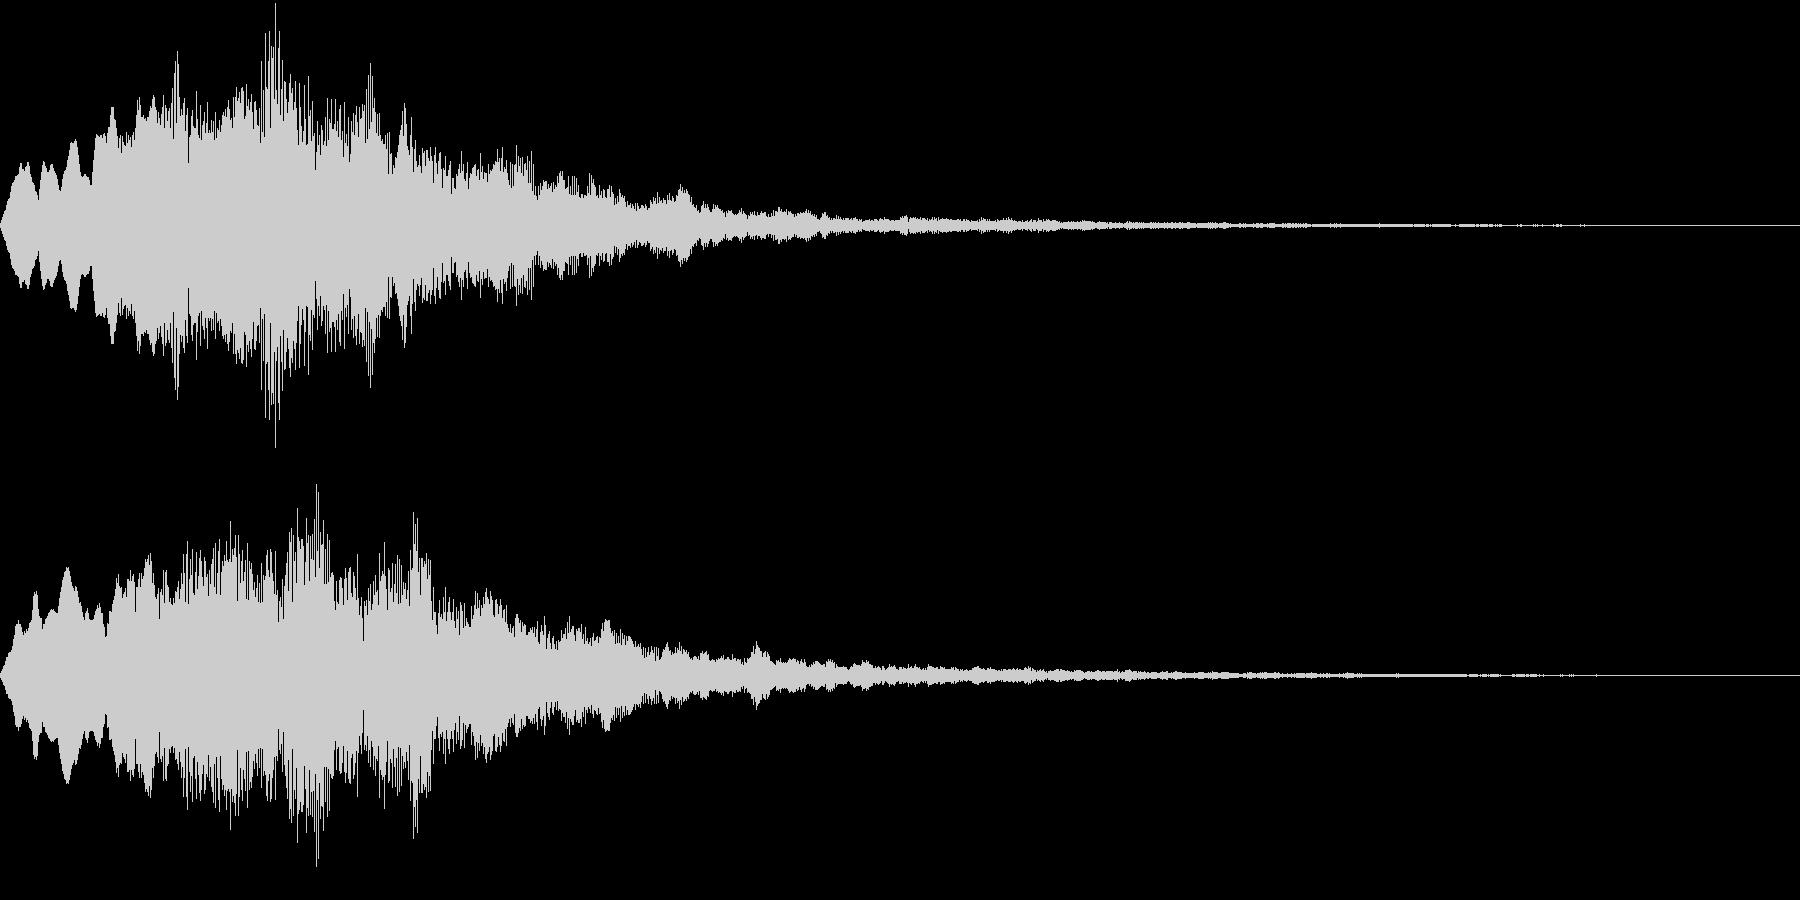 Level 短めのレベルアップSE 2の未再生の波形